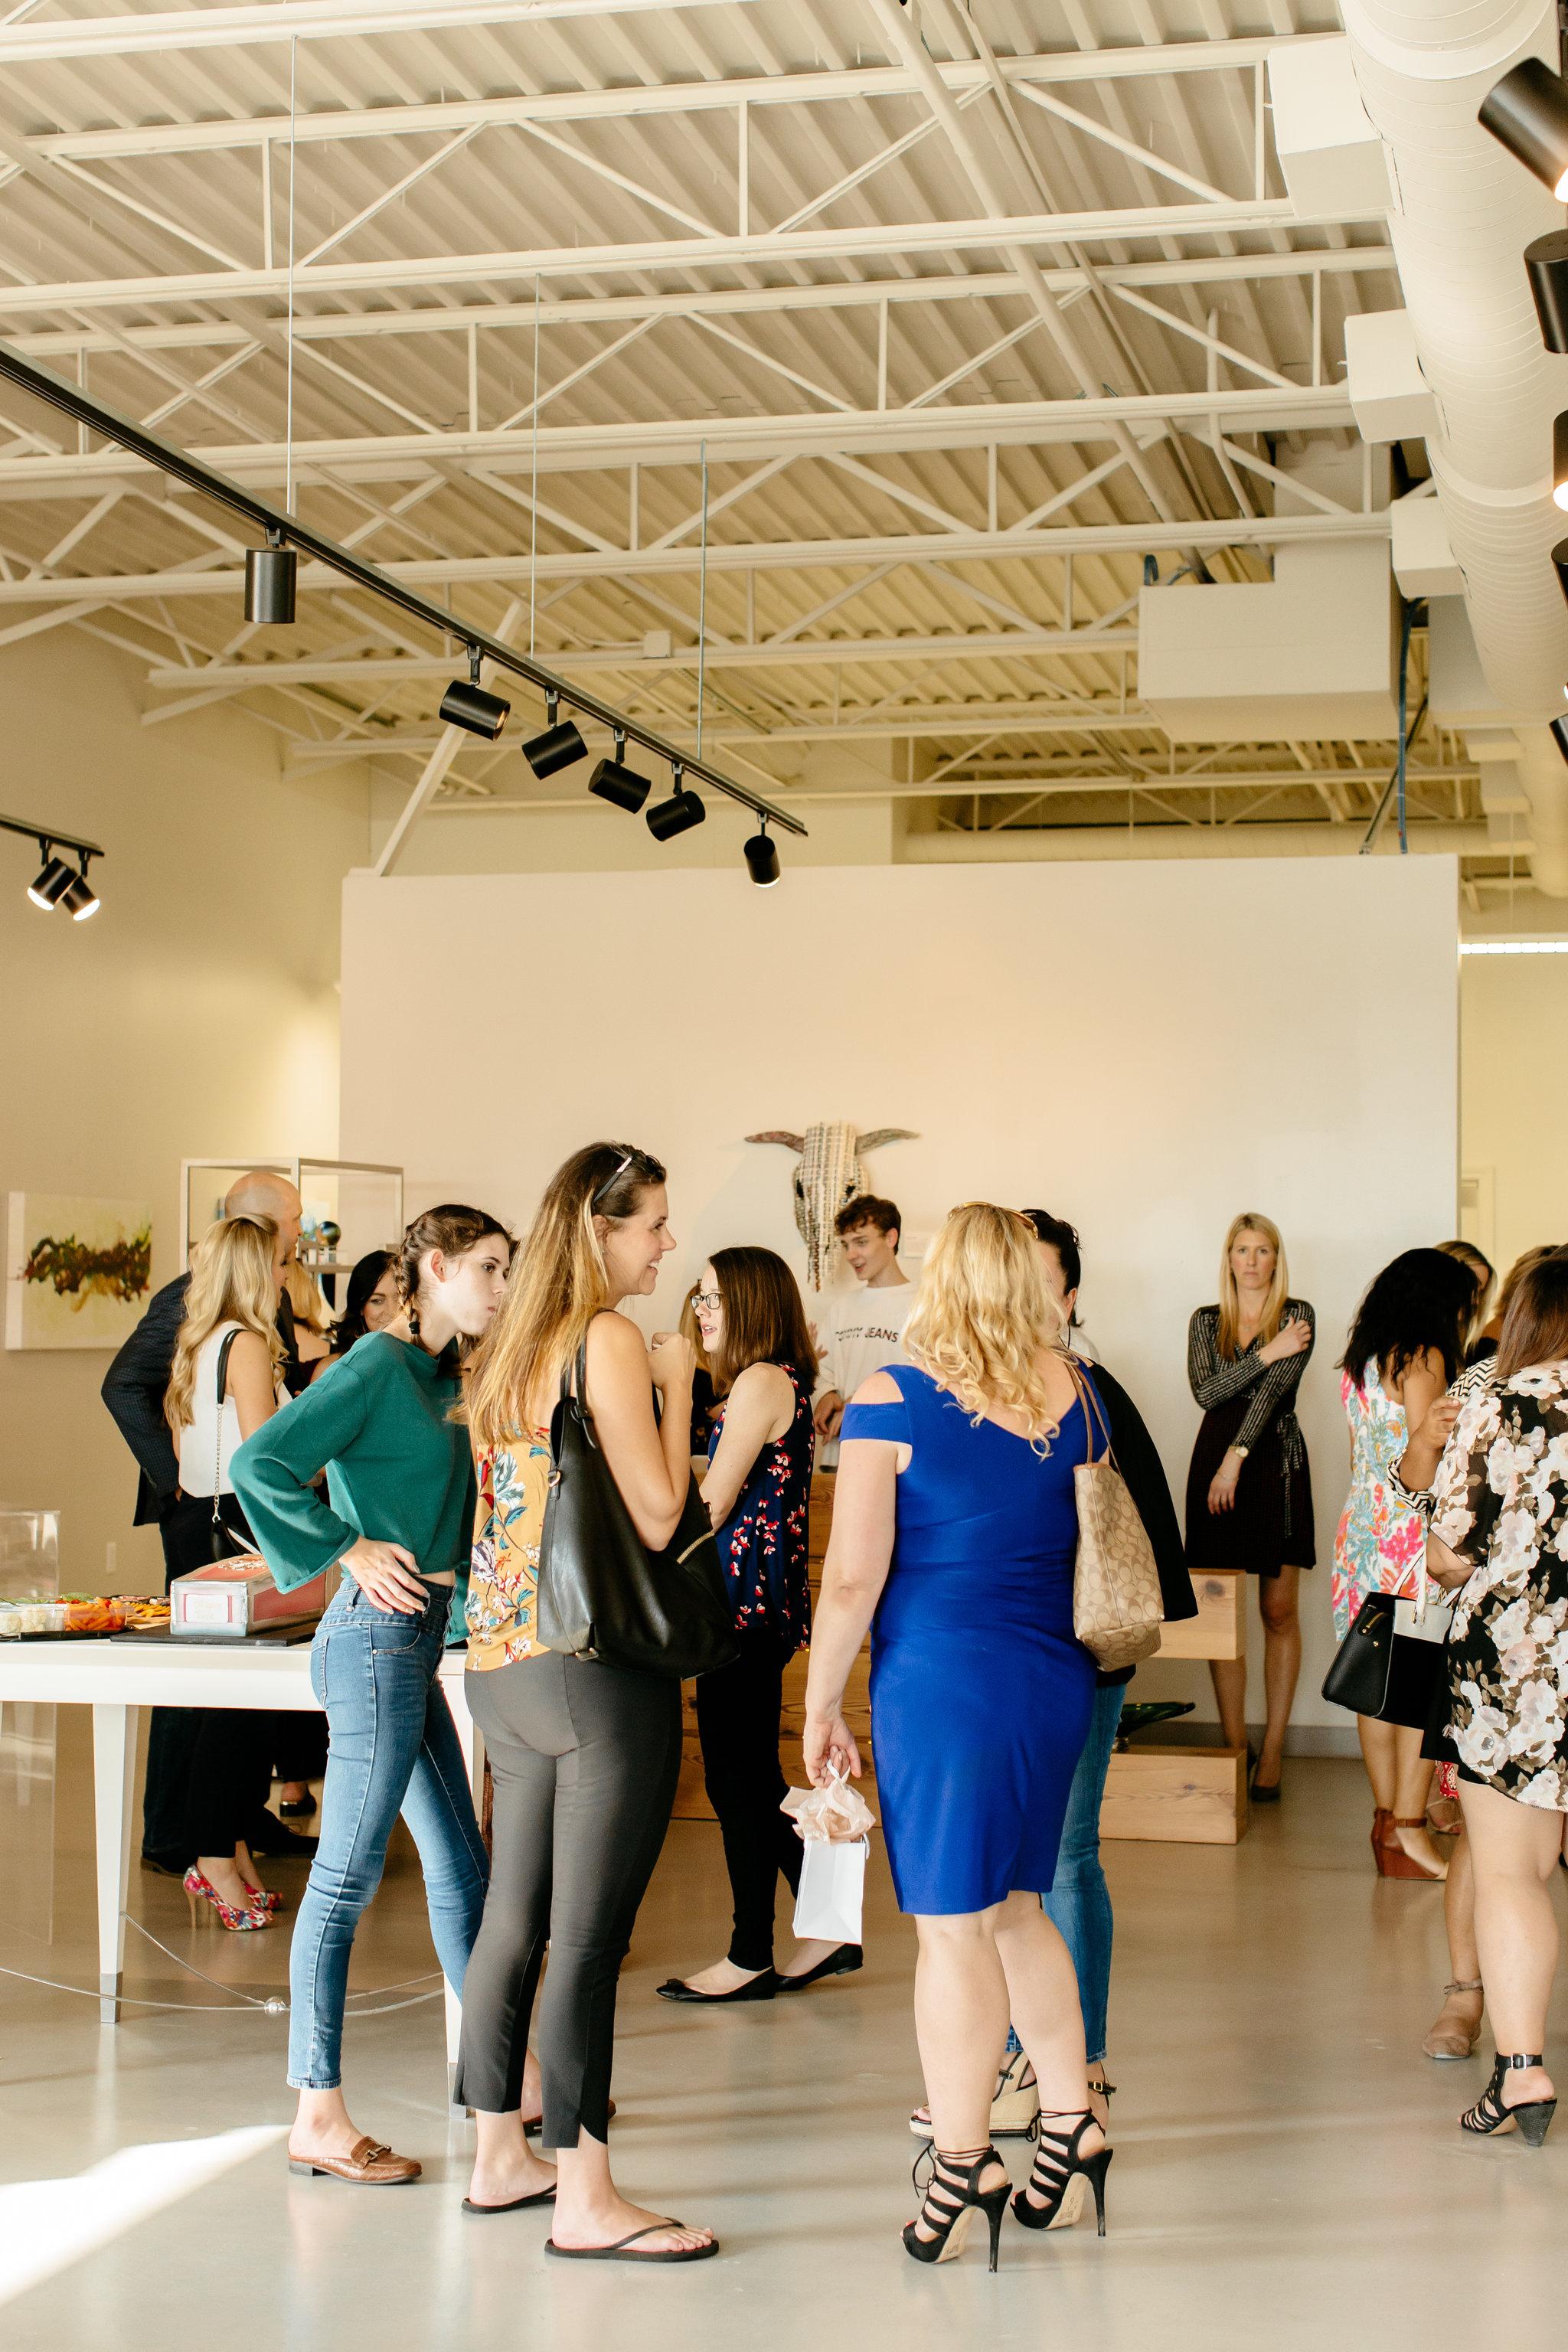 Alexa-Vossler-Photo_Dallas-Event-Photographer_Brite-Bar-Beauty-2018-Lipstick-Launch-Party-66.jpg